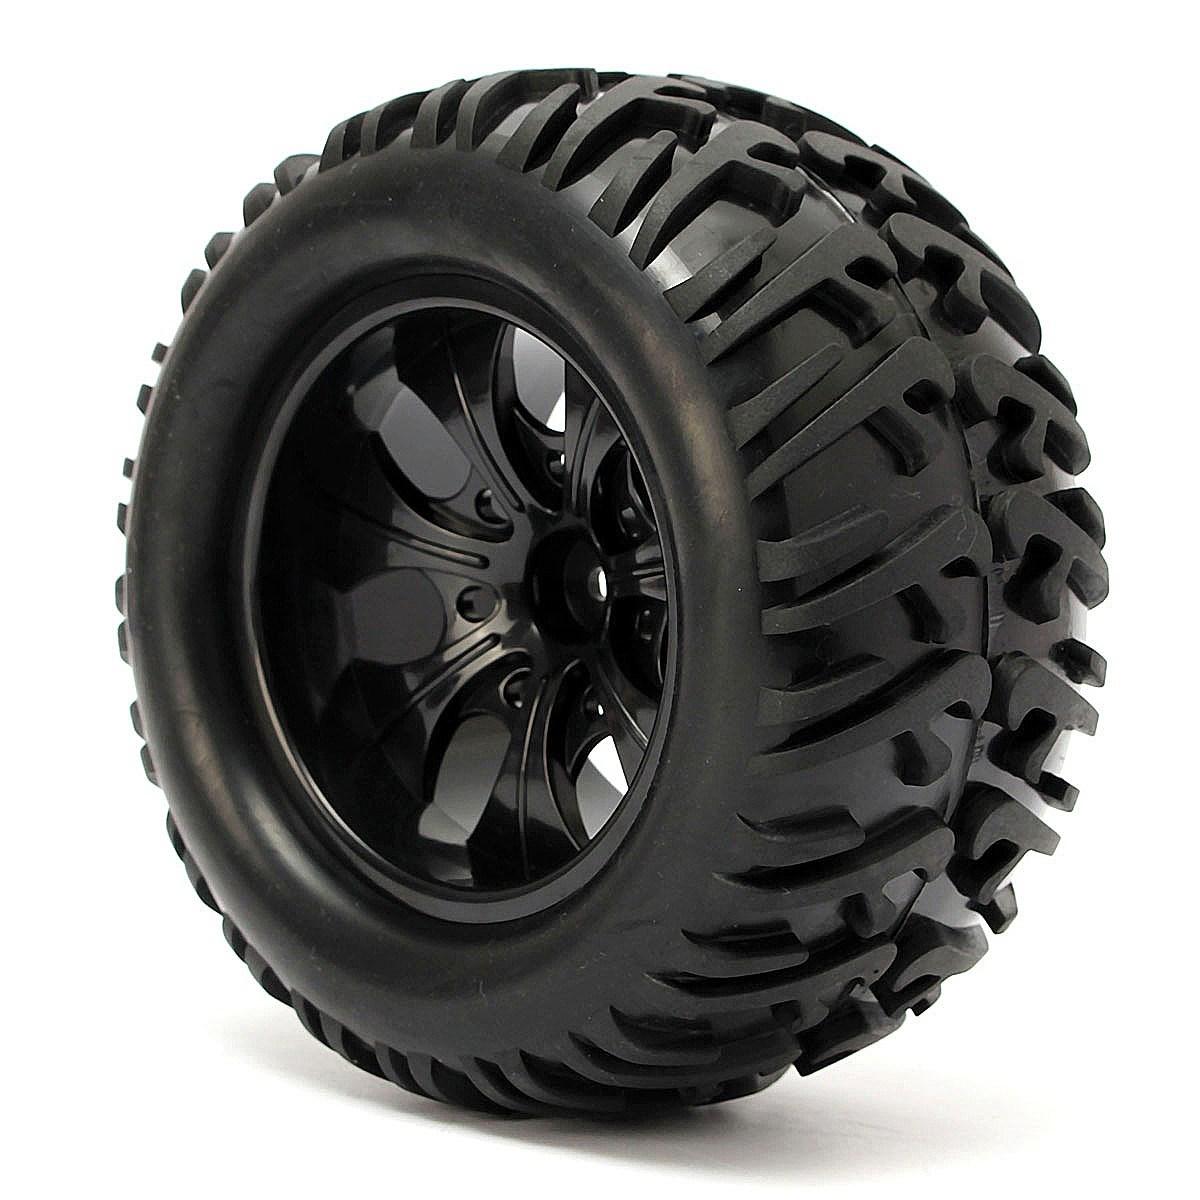 4PCS 12mm Racing Wheel Rim & Tires Redcat HSP 1:10 Monster truck RC On-Road Car Parts 12mm Hub 88005(China (Mainland))